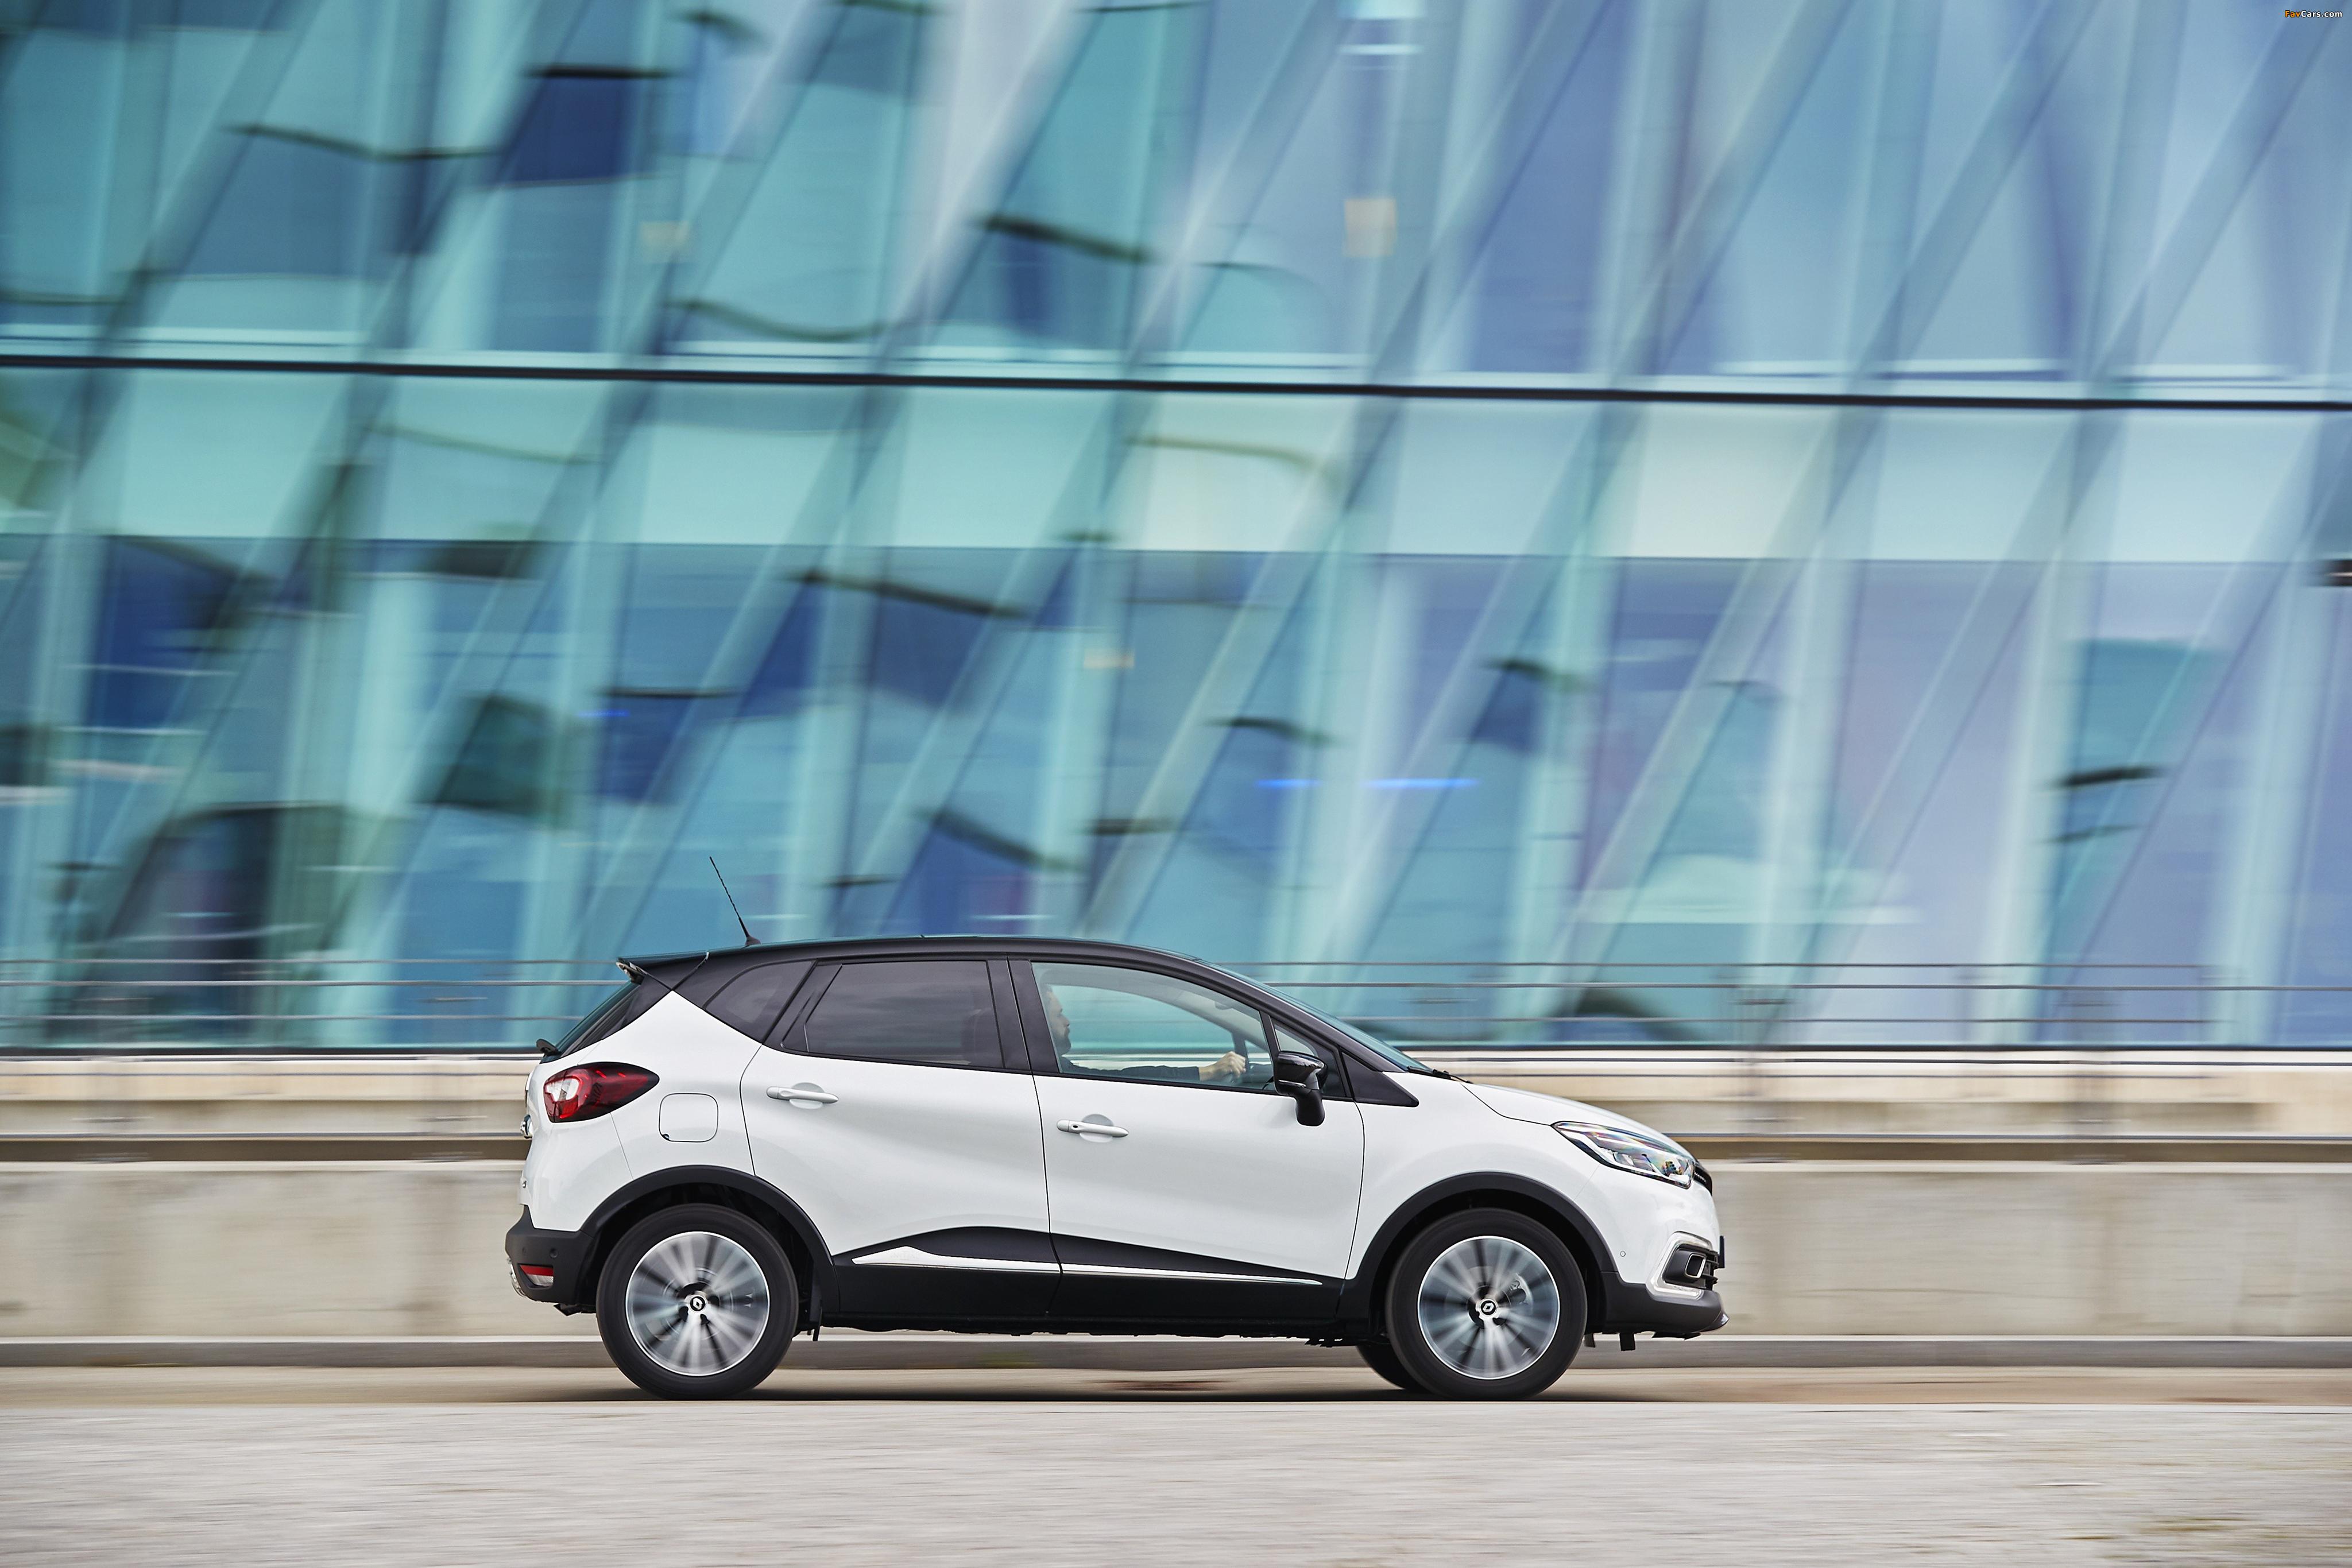 Renault Captur Initiale Paris 2017 photos (4096 x 2731)